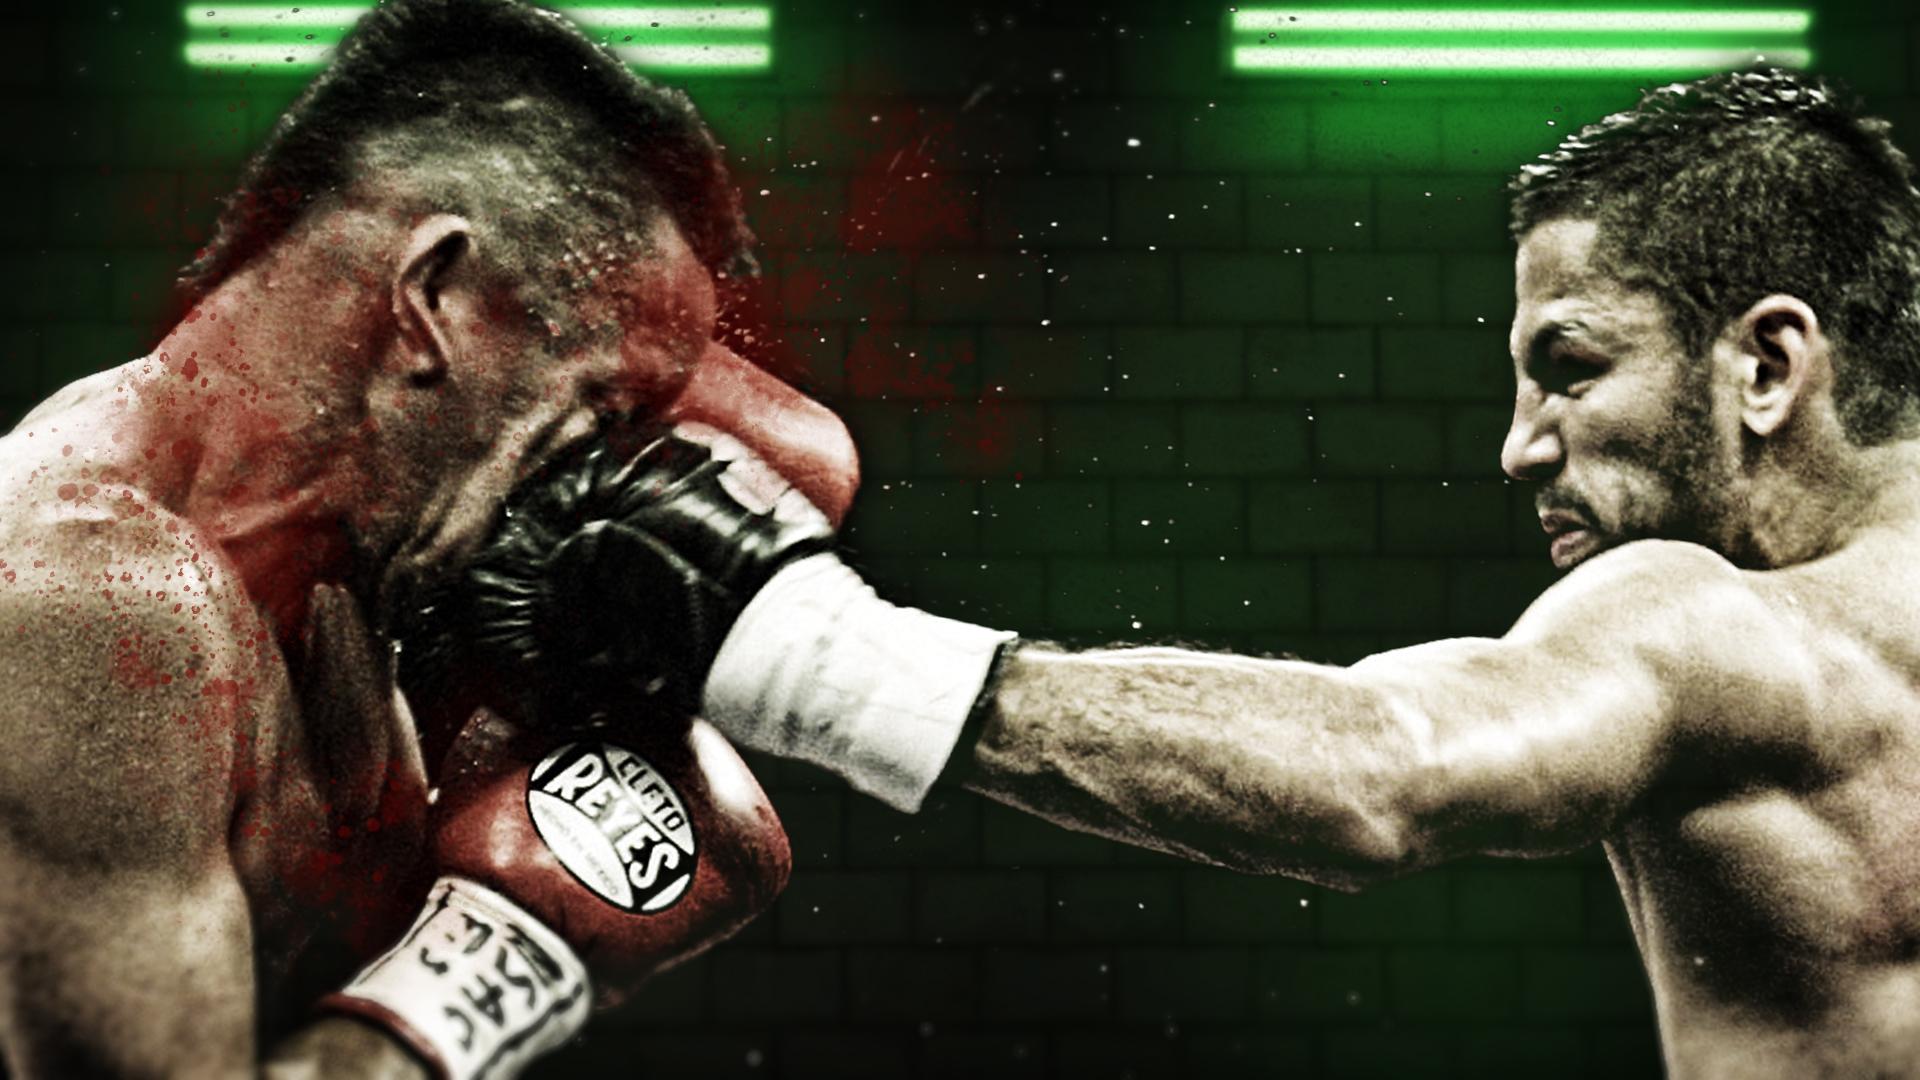 UFC_StyleFrameV2_Frame08_V2.jpg